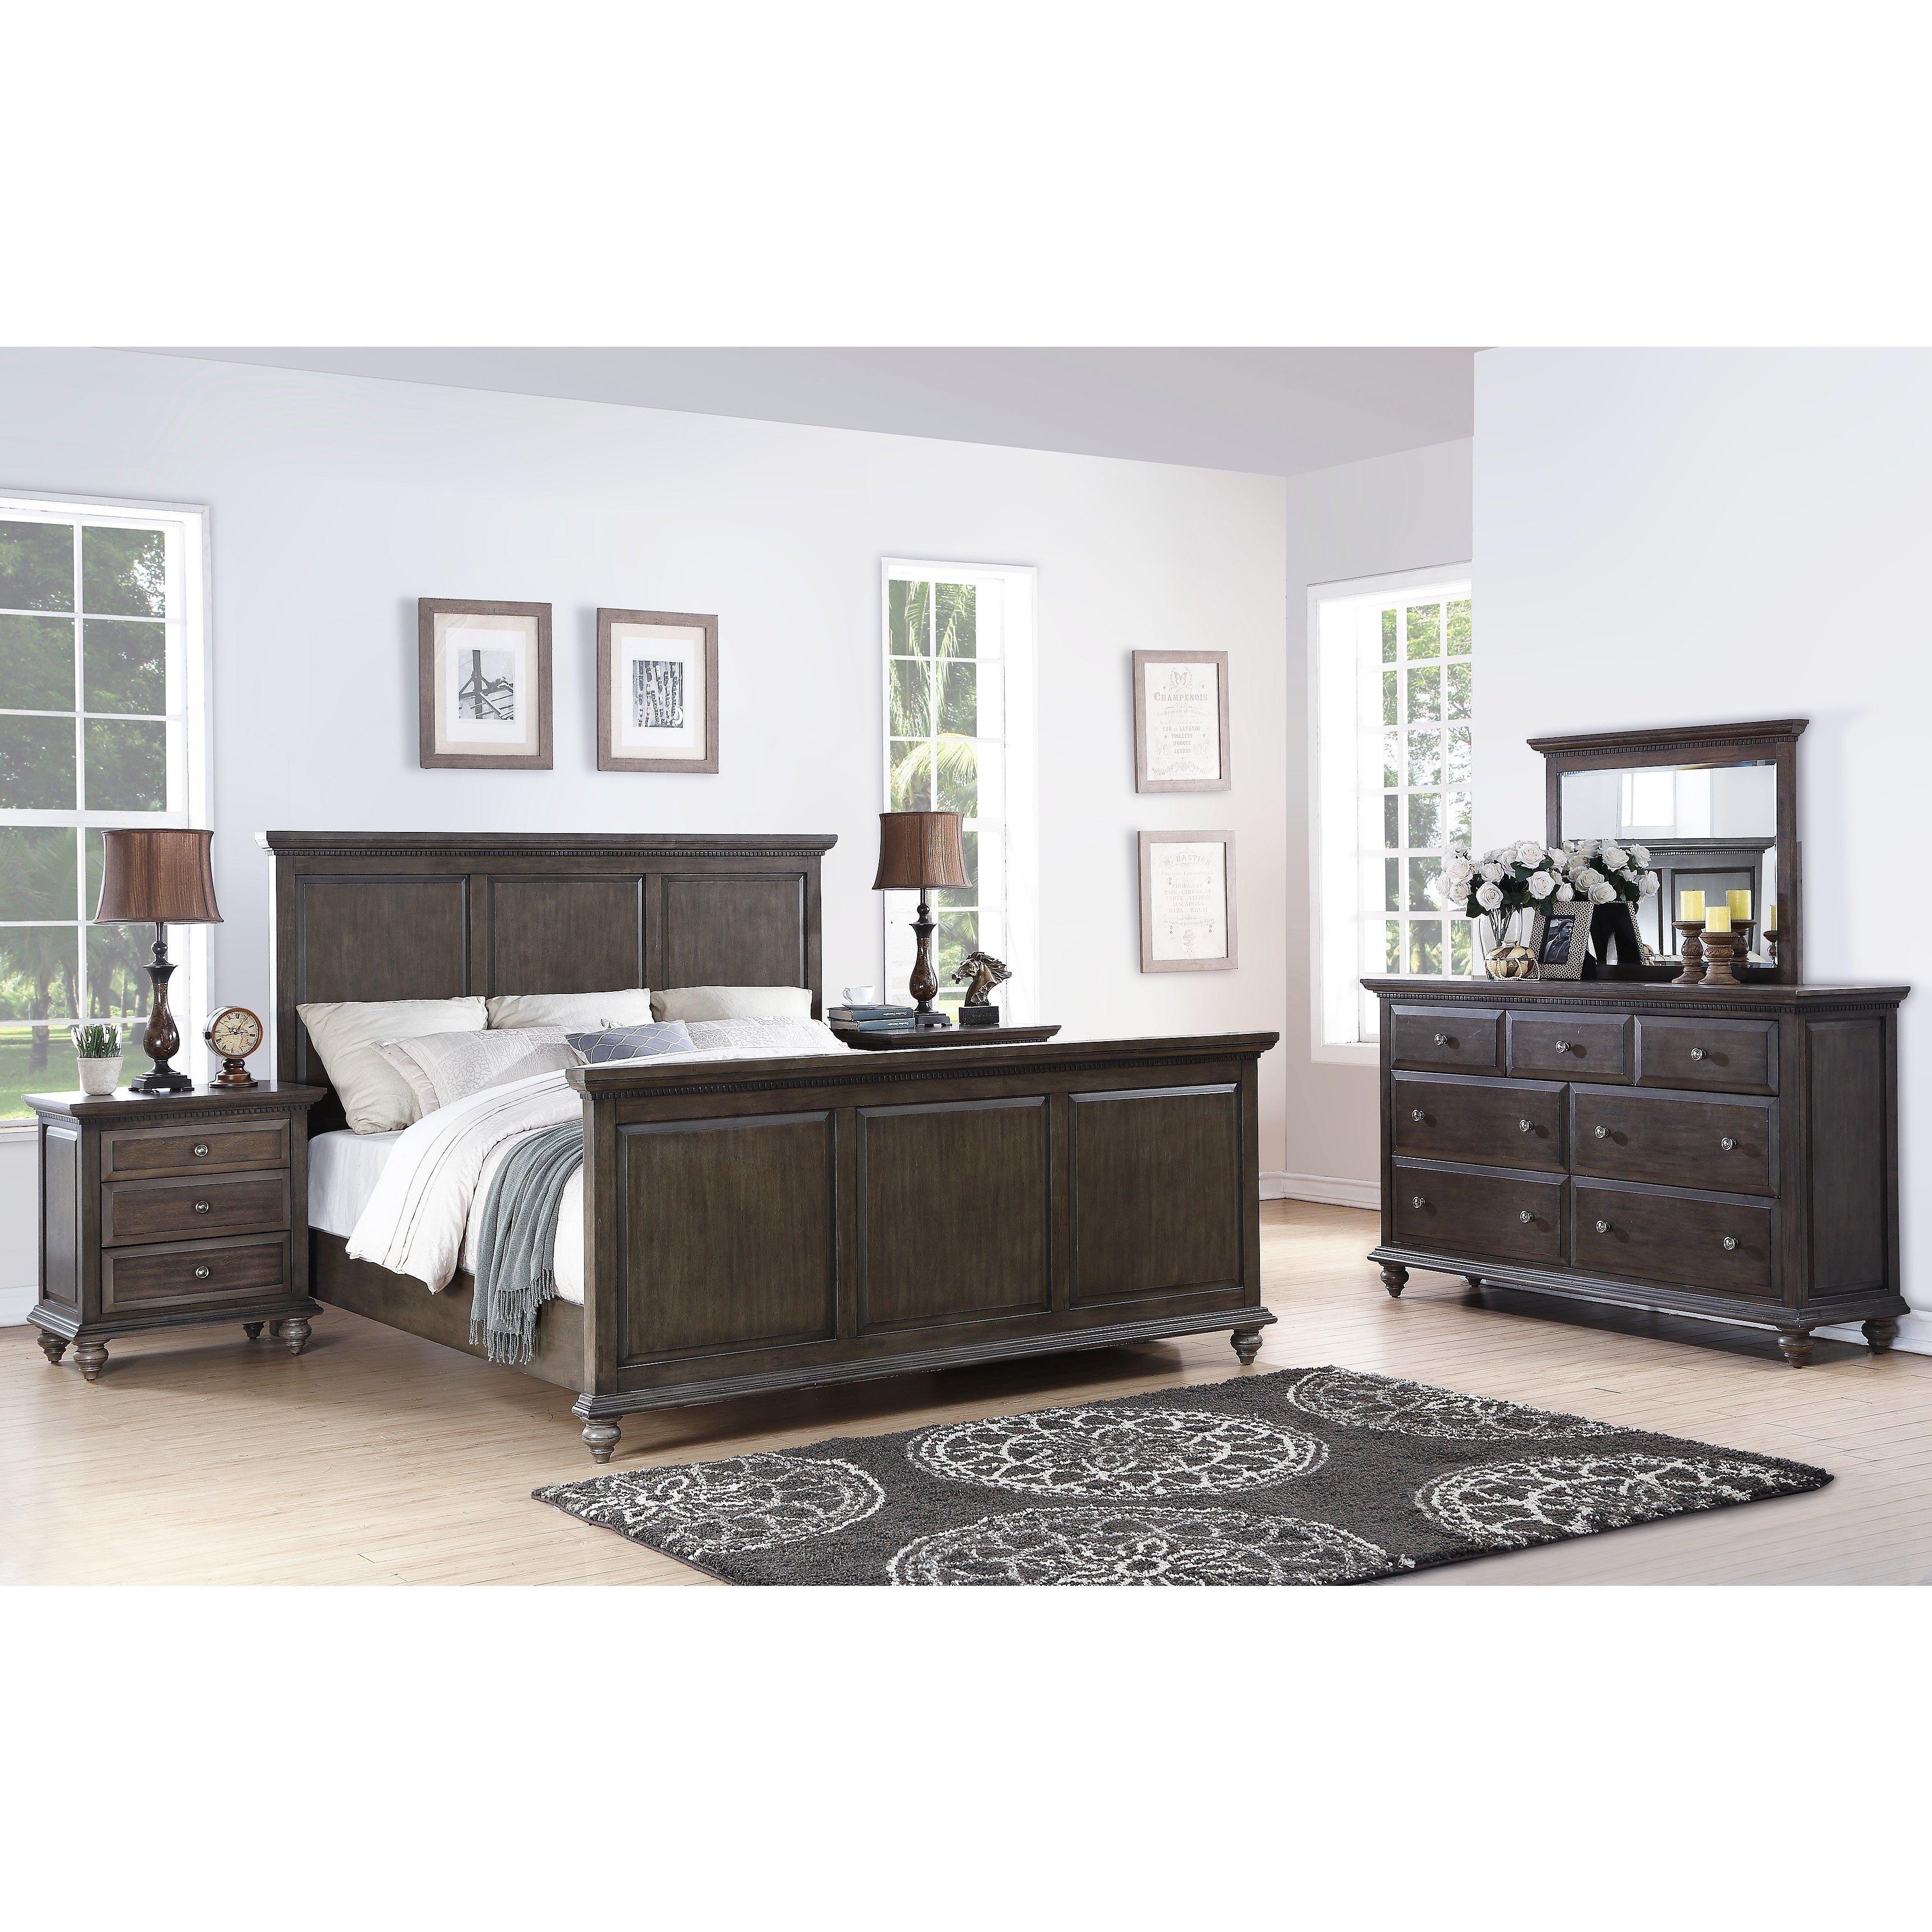 Grey Queen Bedroom Set Beautiful Abbyson Marseilles City Grey 5 Piece Bedroom Set